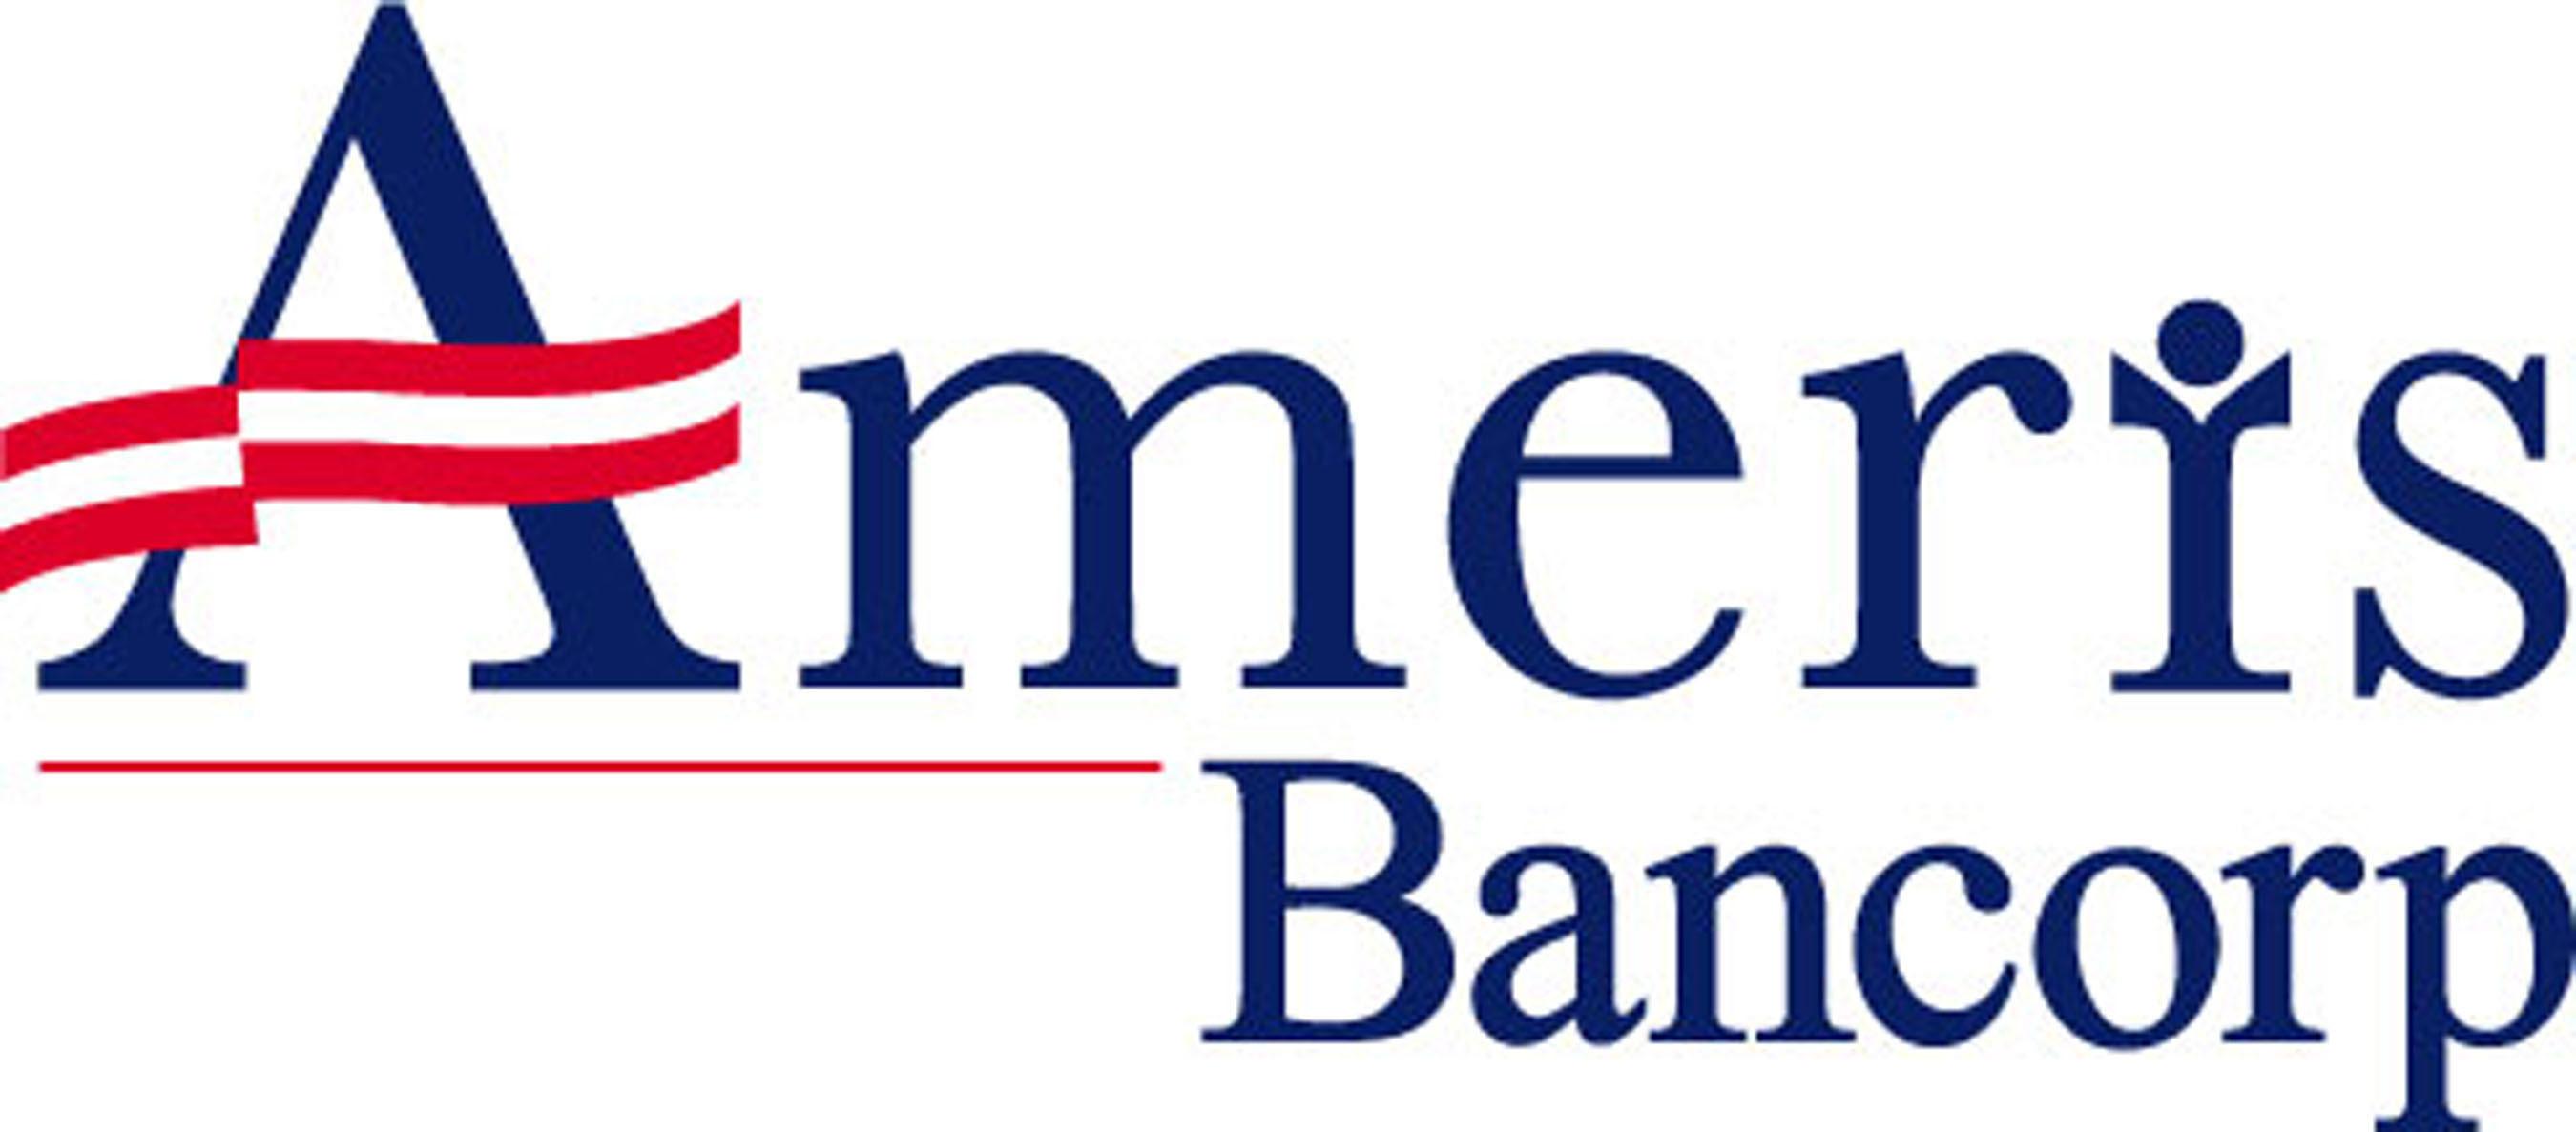 Ameris Bancorp logo.